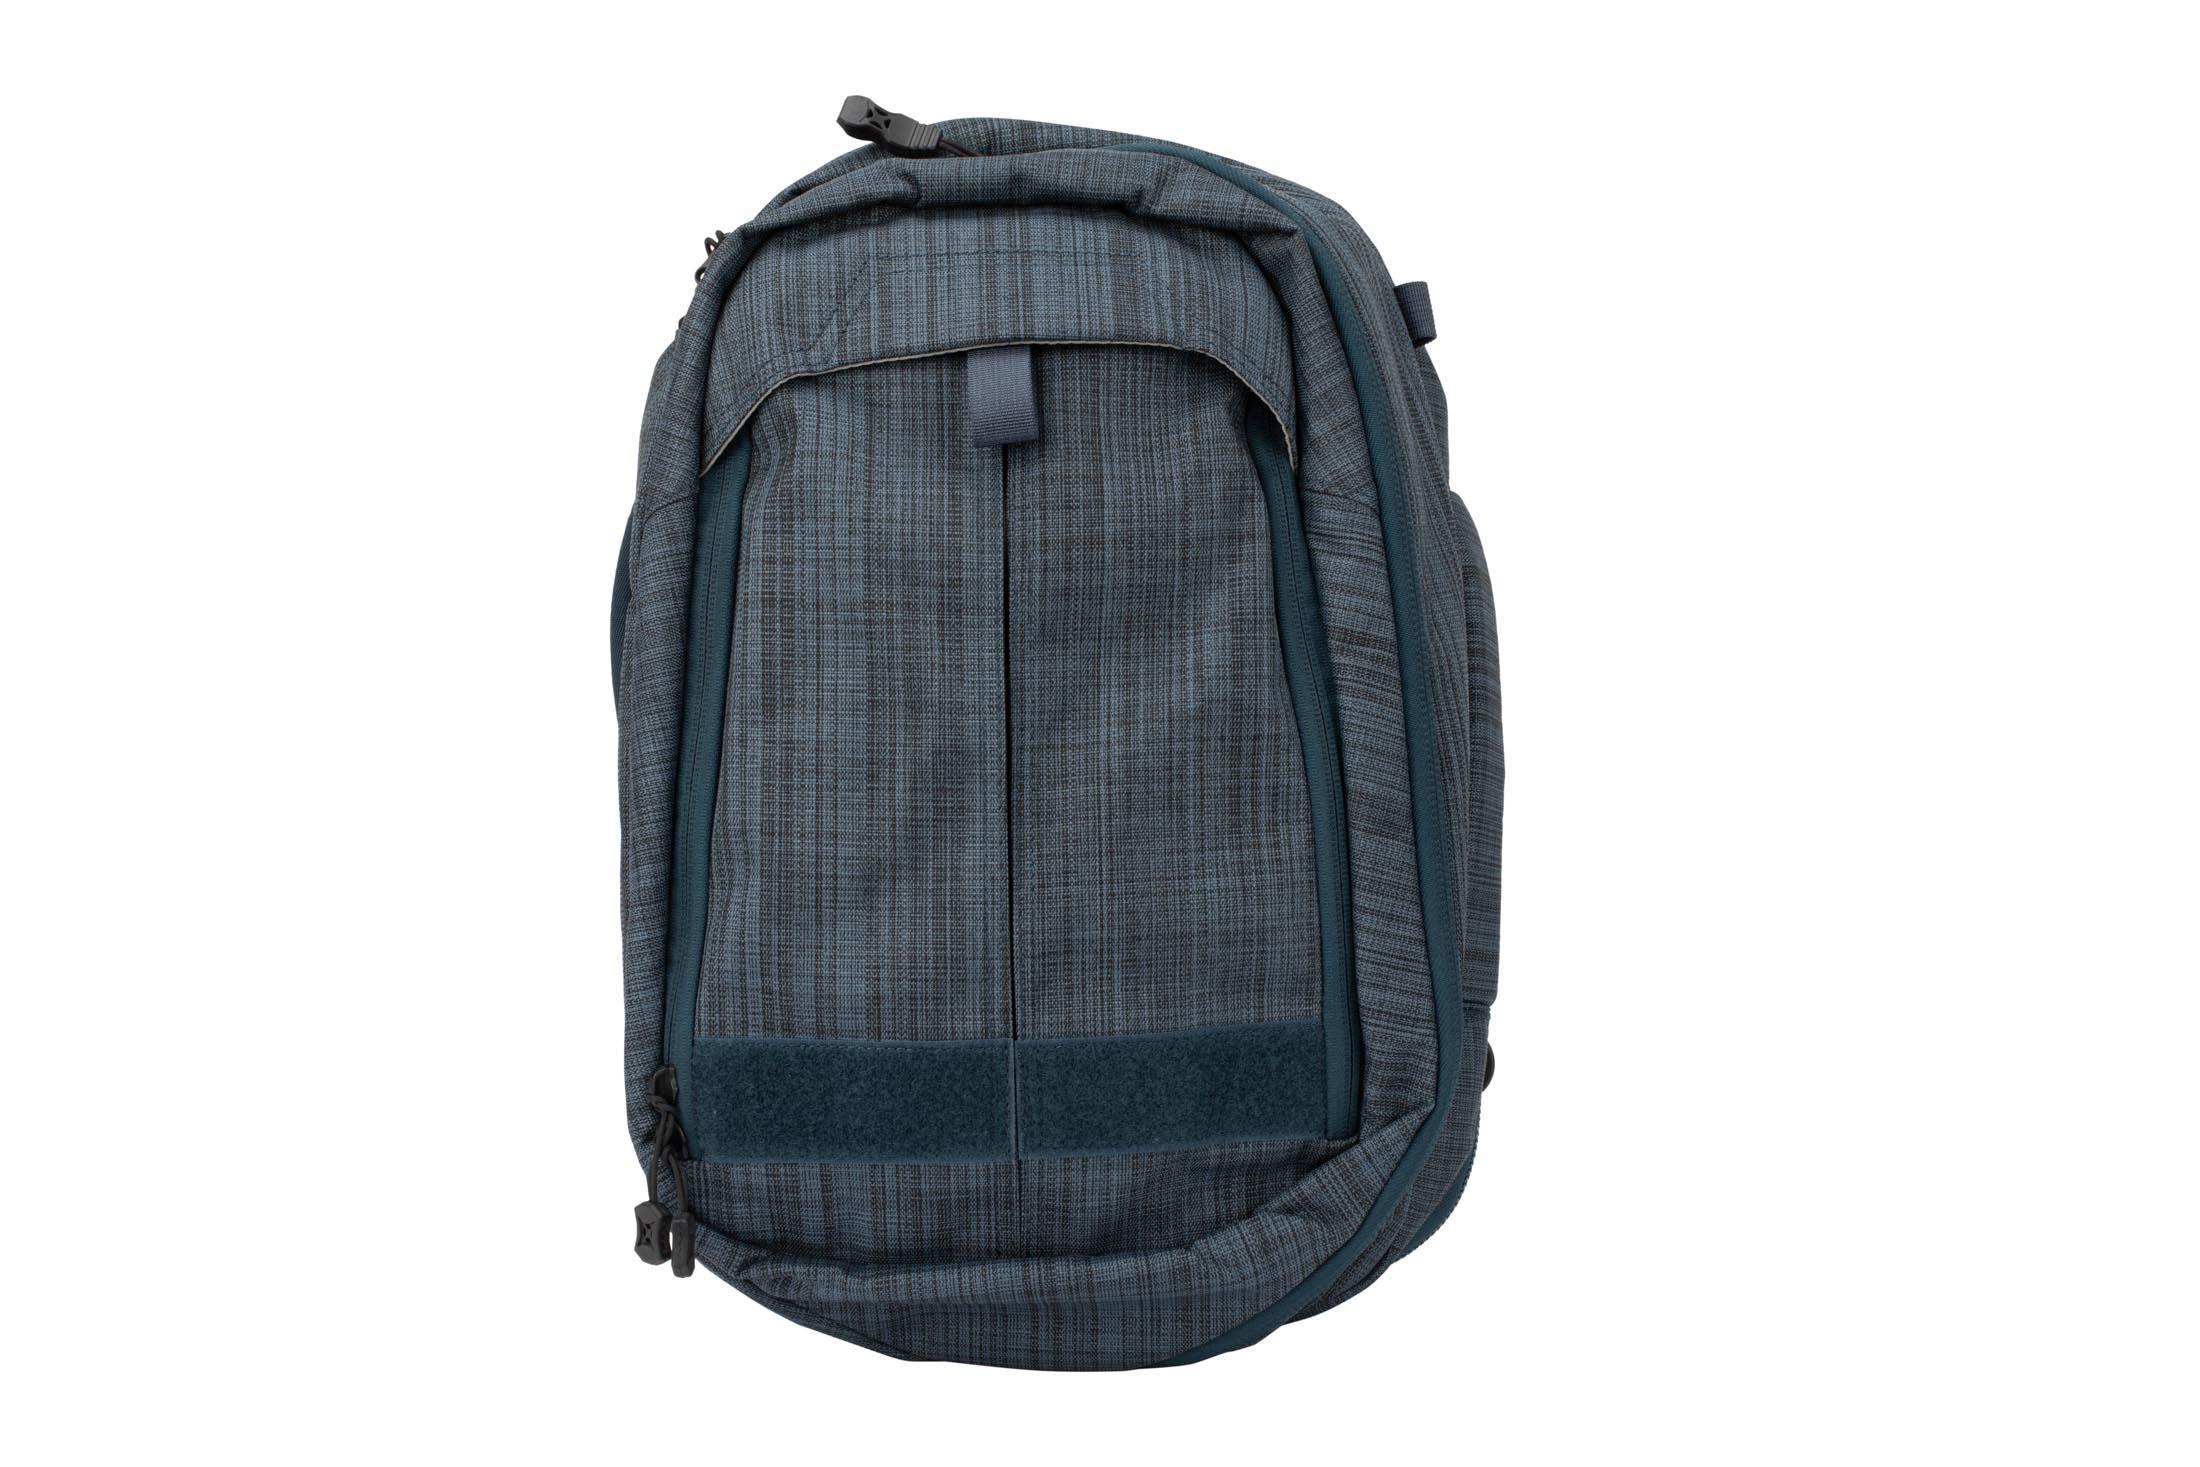 Vertx backpack